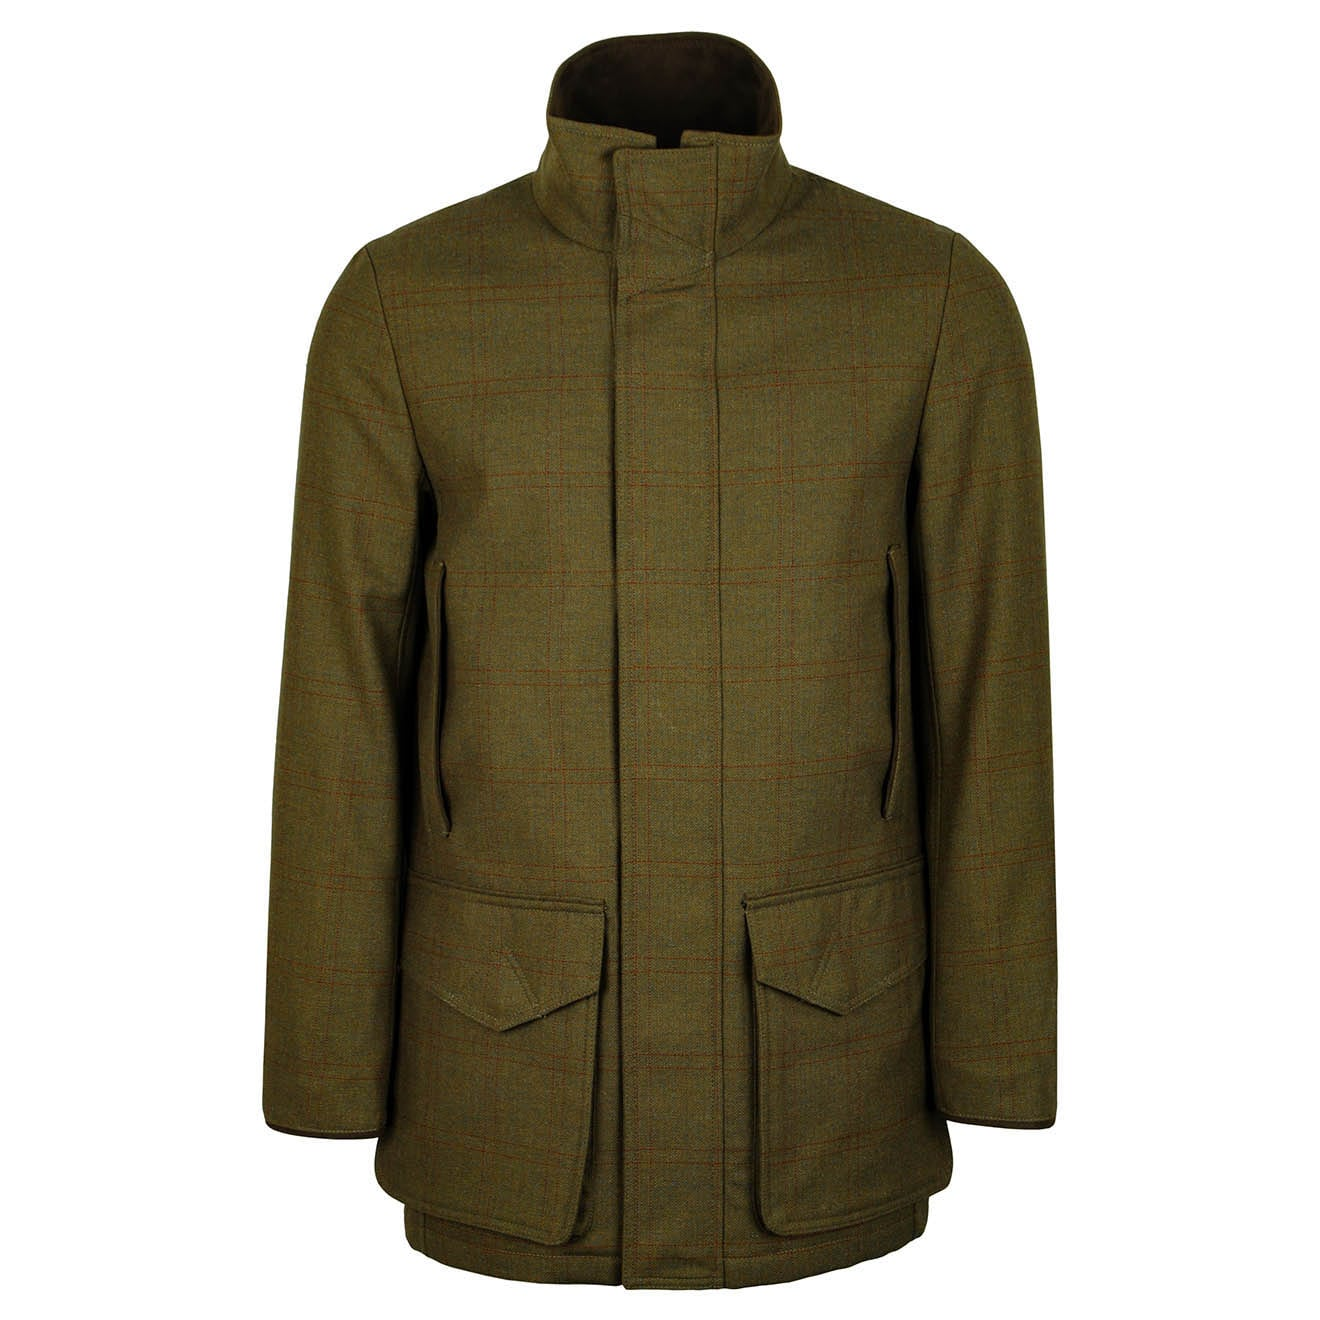 7e74cf197b190 James Purdey Technical Tweed Field Coat Bembridge - The Sporting Lodge